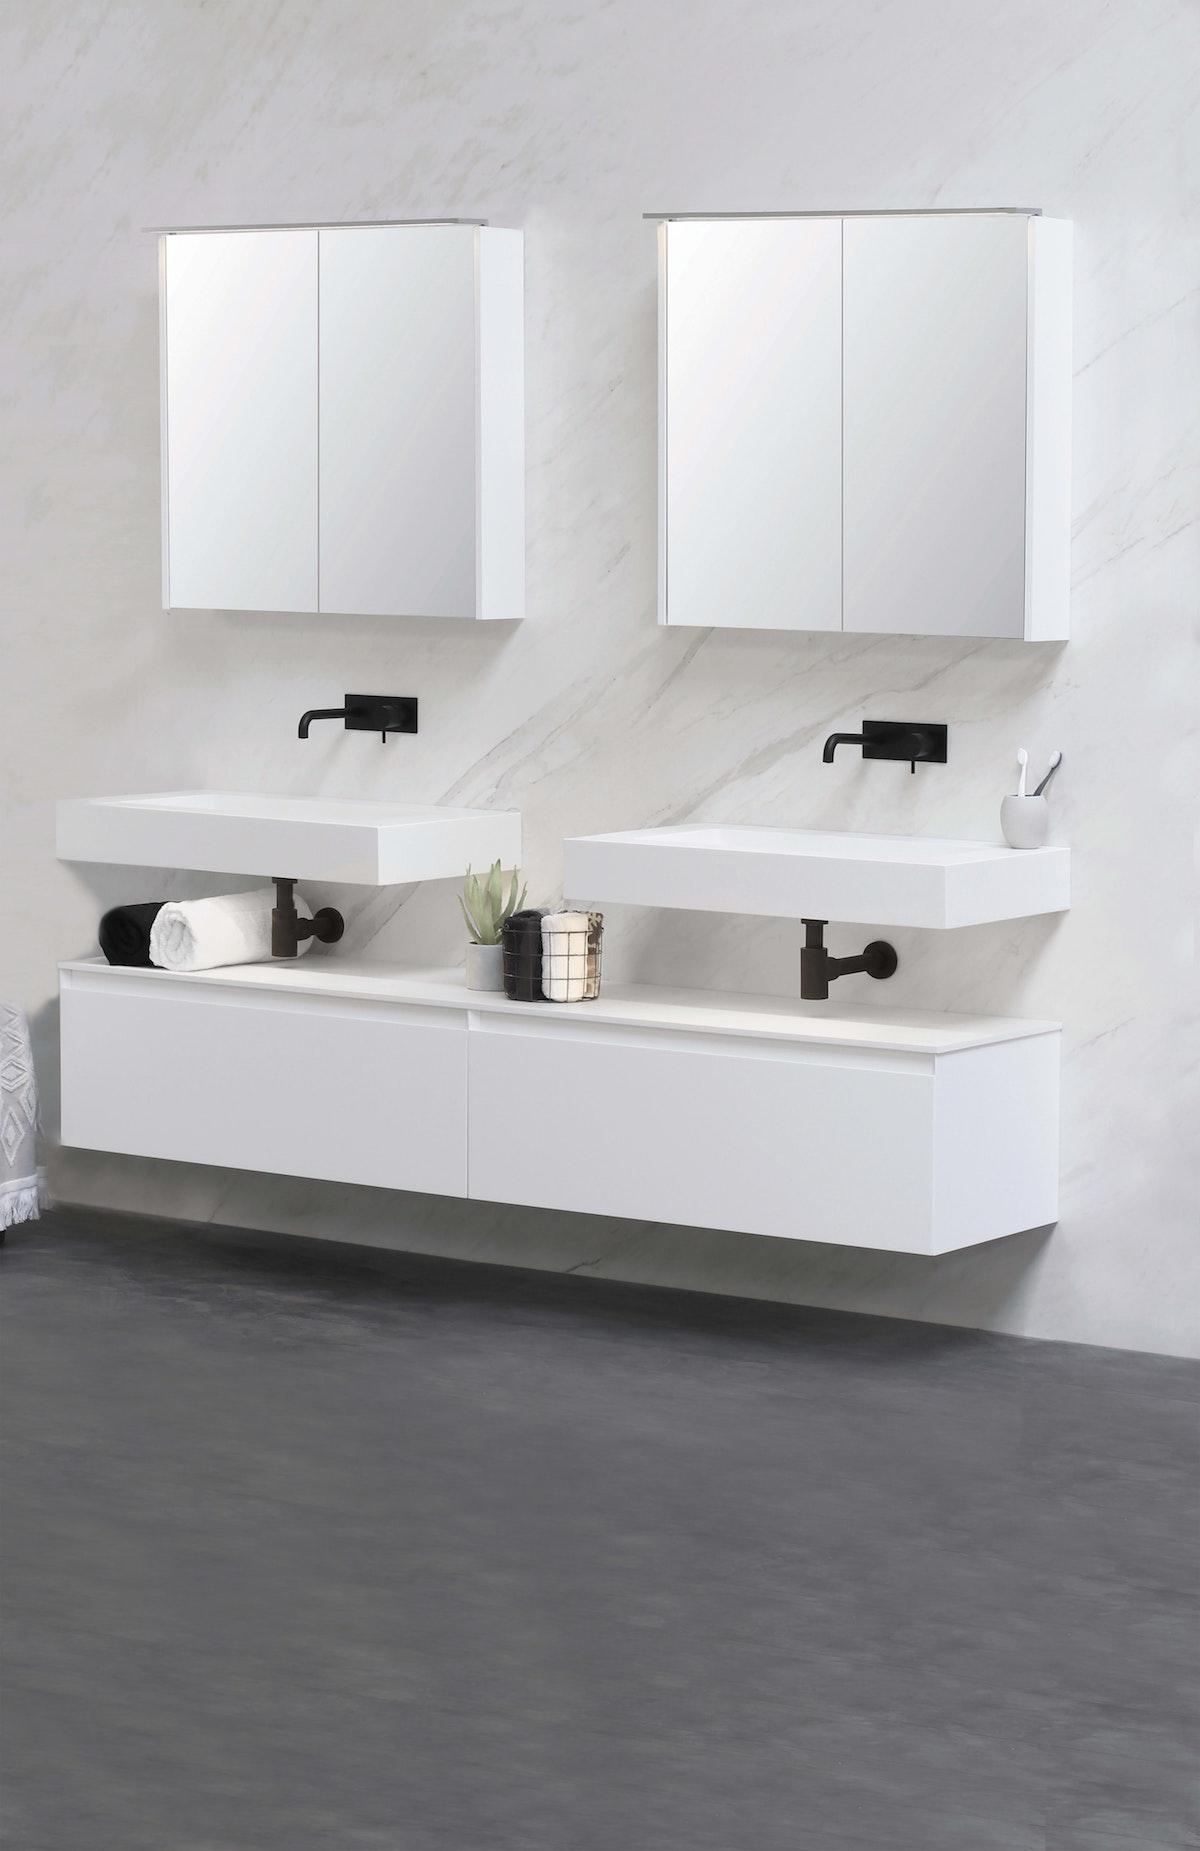 Mirrored Bathroom Cabinets